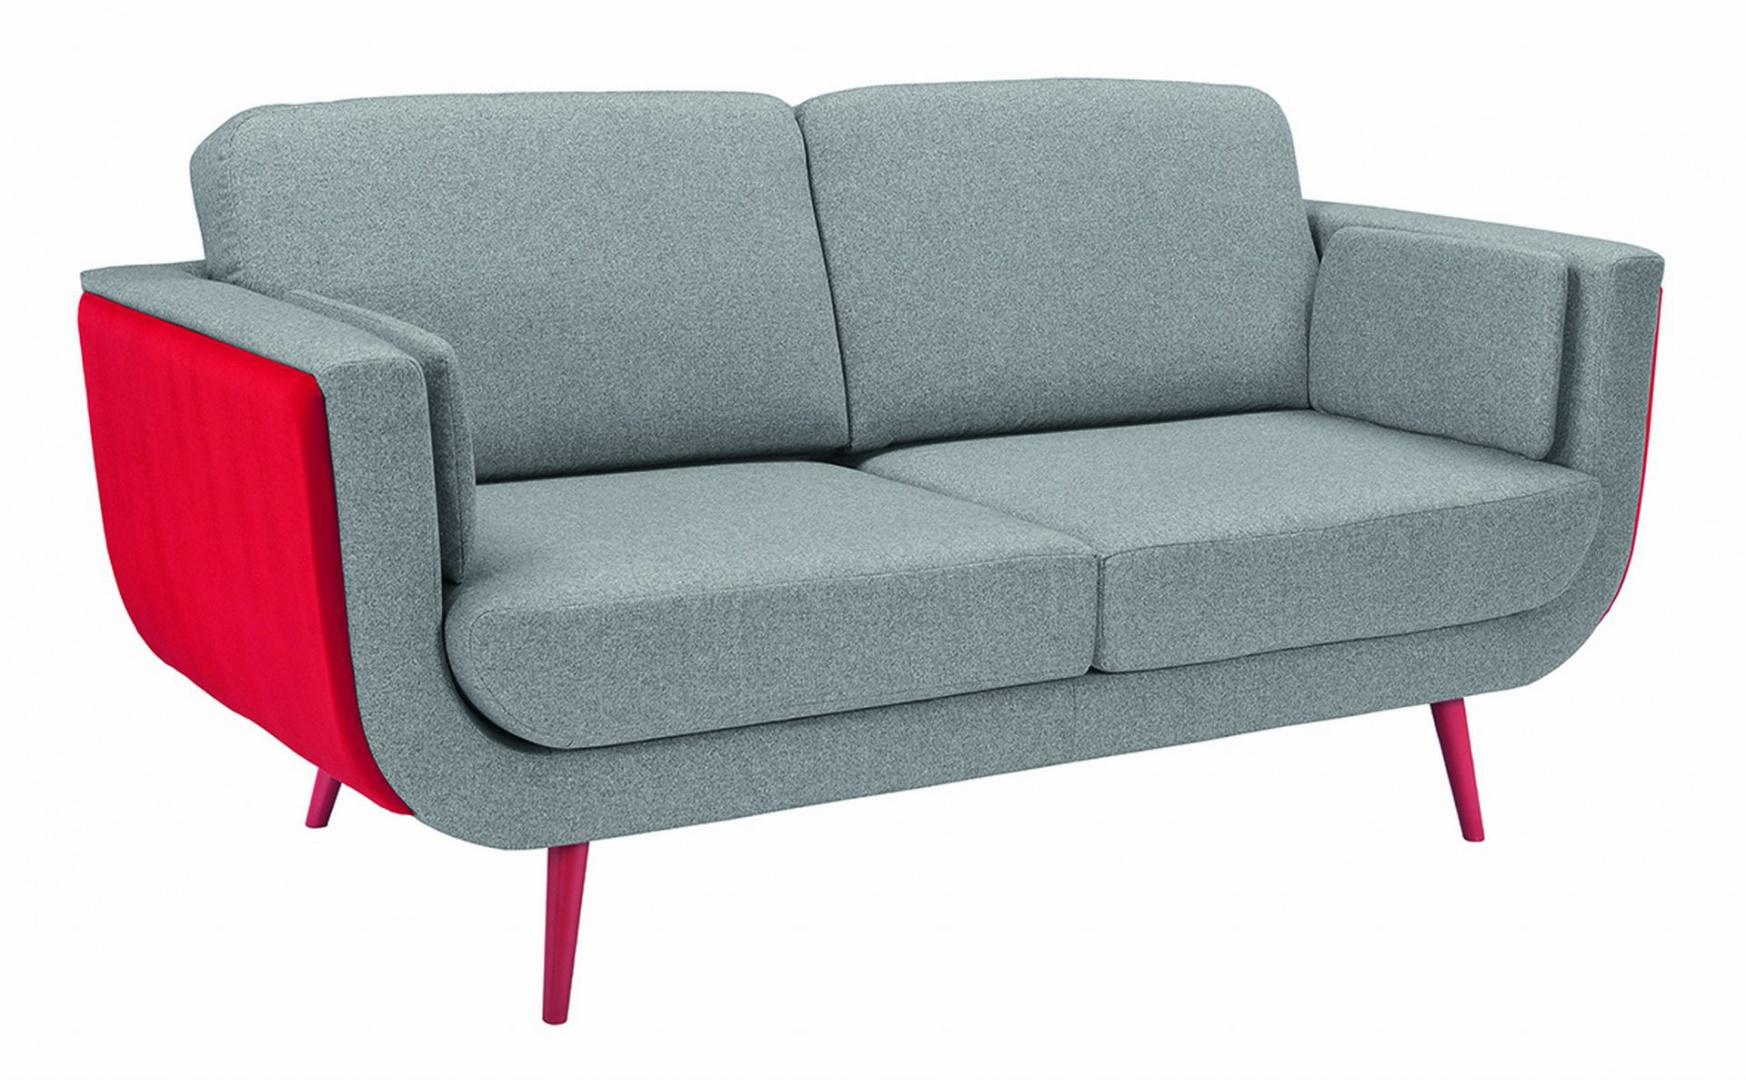 Sofa Possi Light/Black Red White